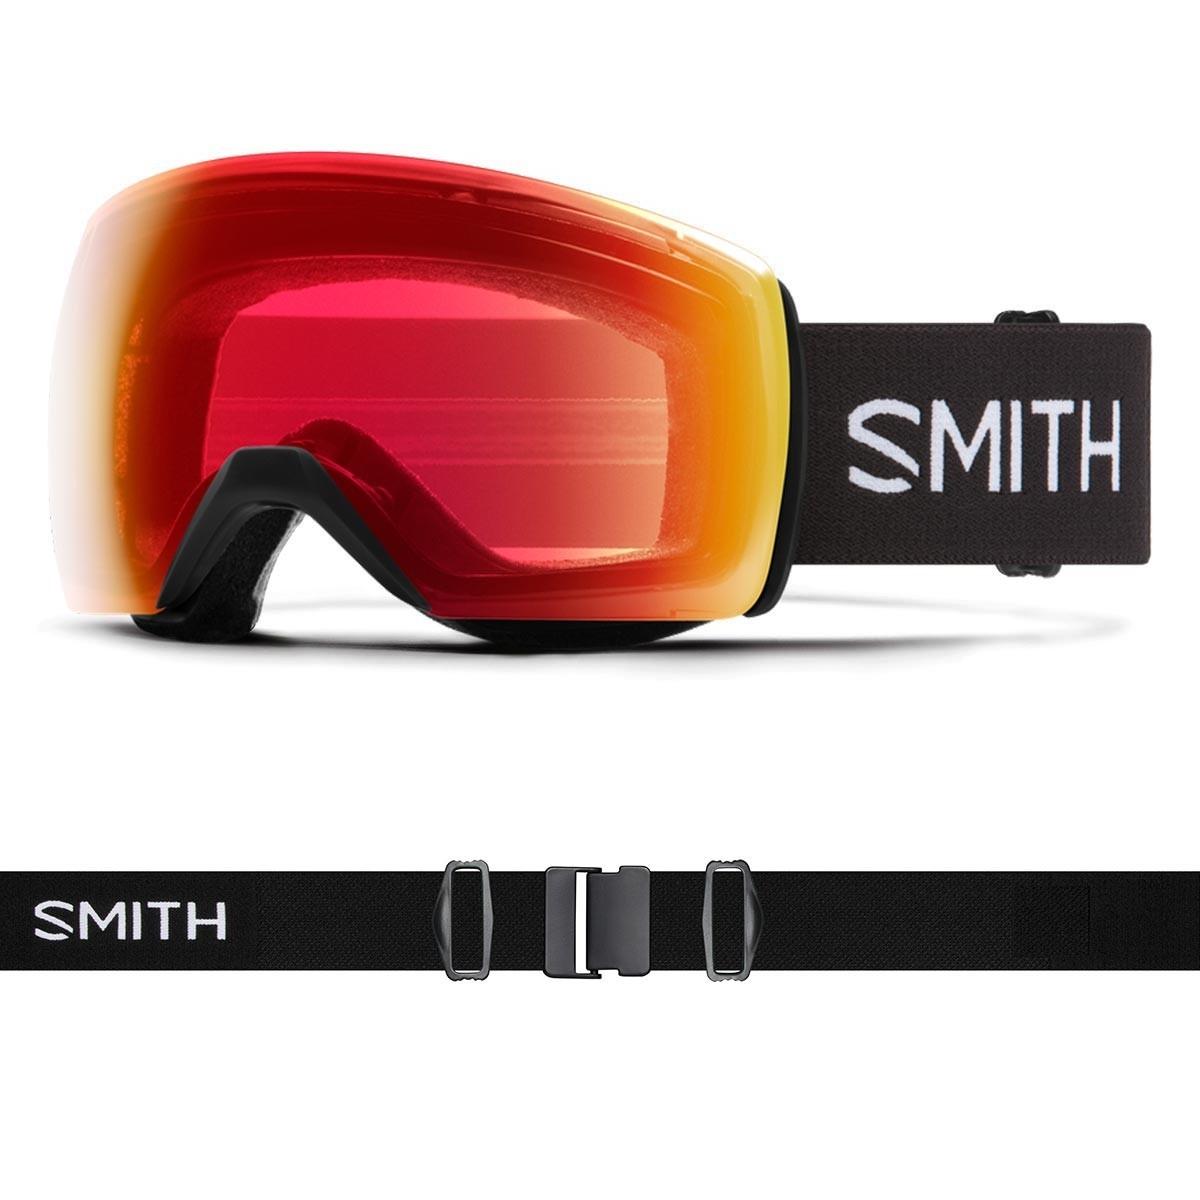 SMITH SKYLINE XL black | S2-S1 CHROMAPOP Photochromic Rose Flash - Изображение - AQUAMATRIX